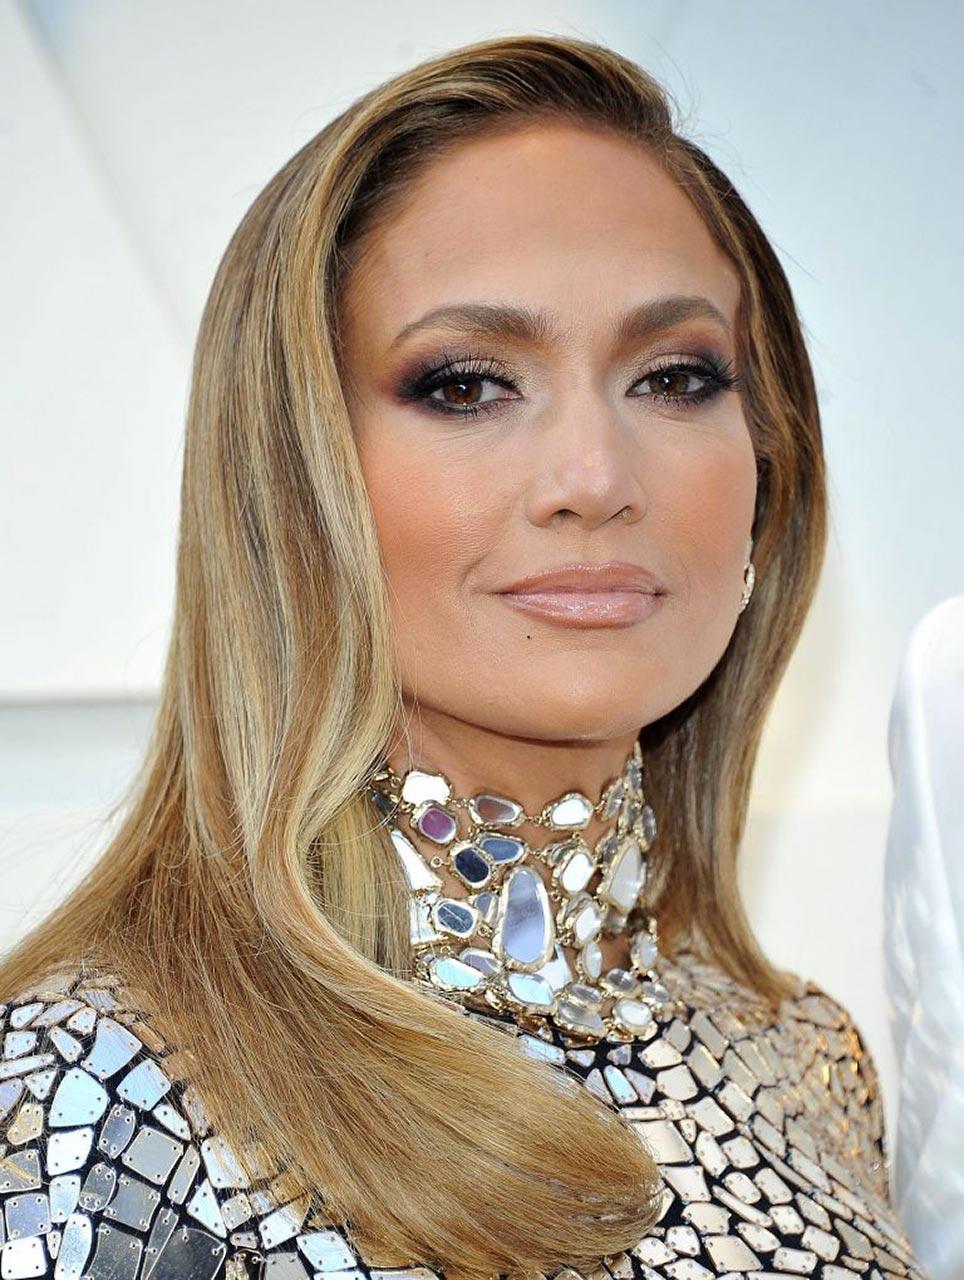 Jennifer Lopez Hot Outfits for Oscars 2019 - Scandal Planet